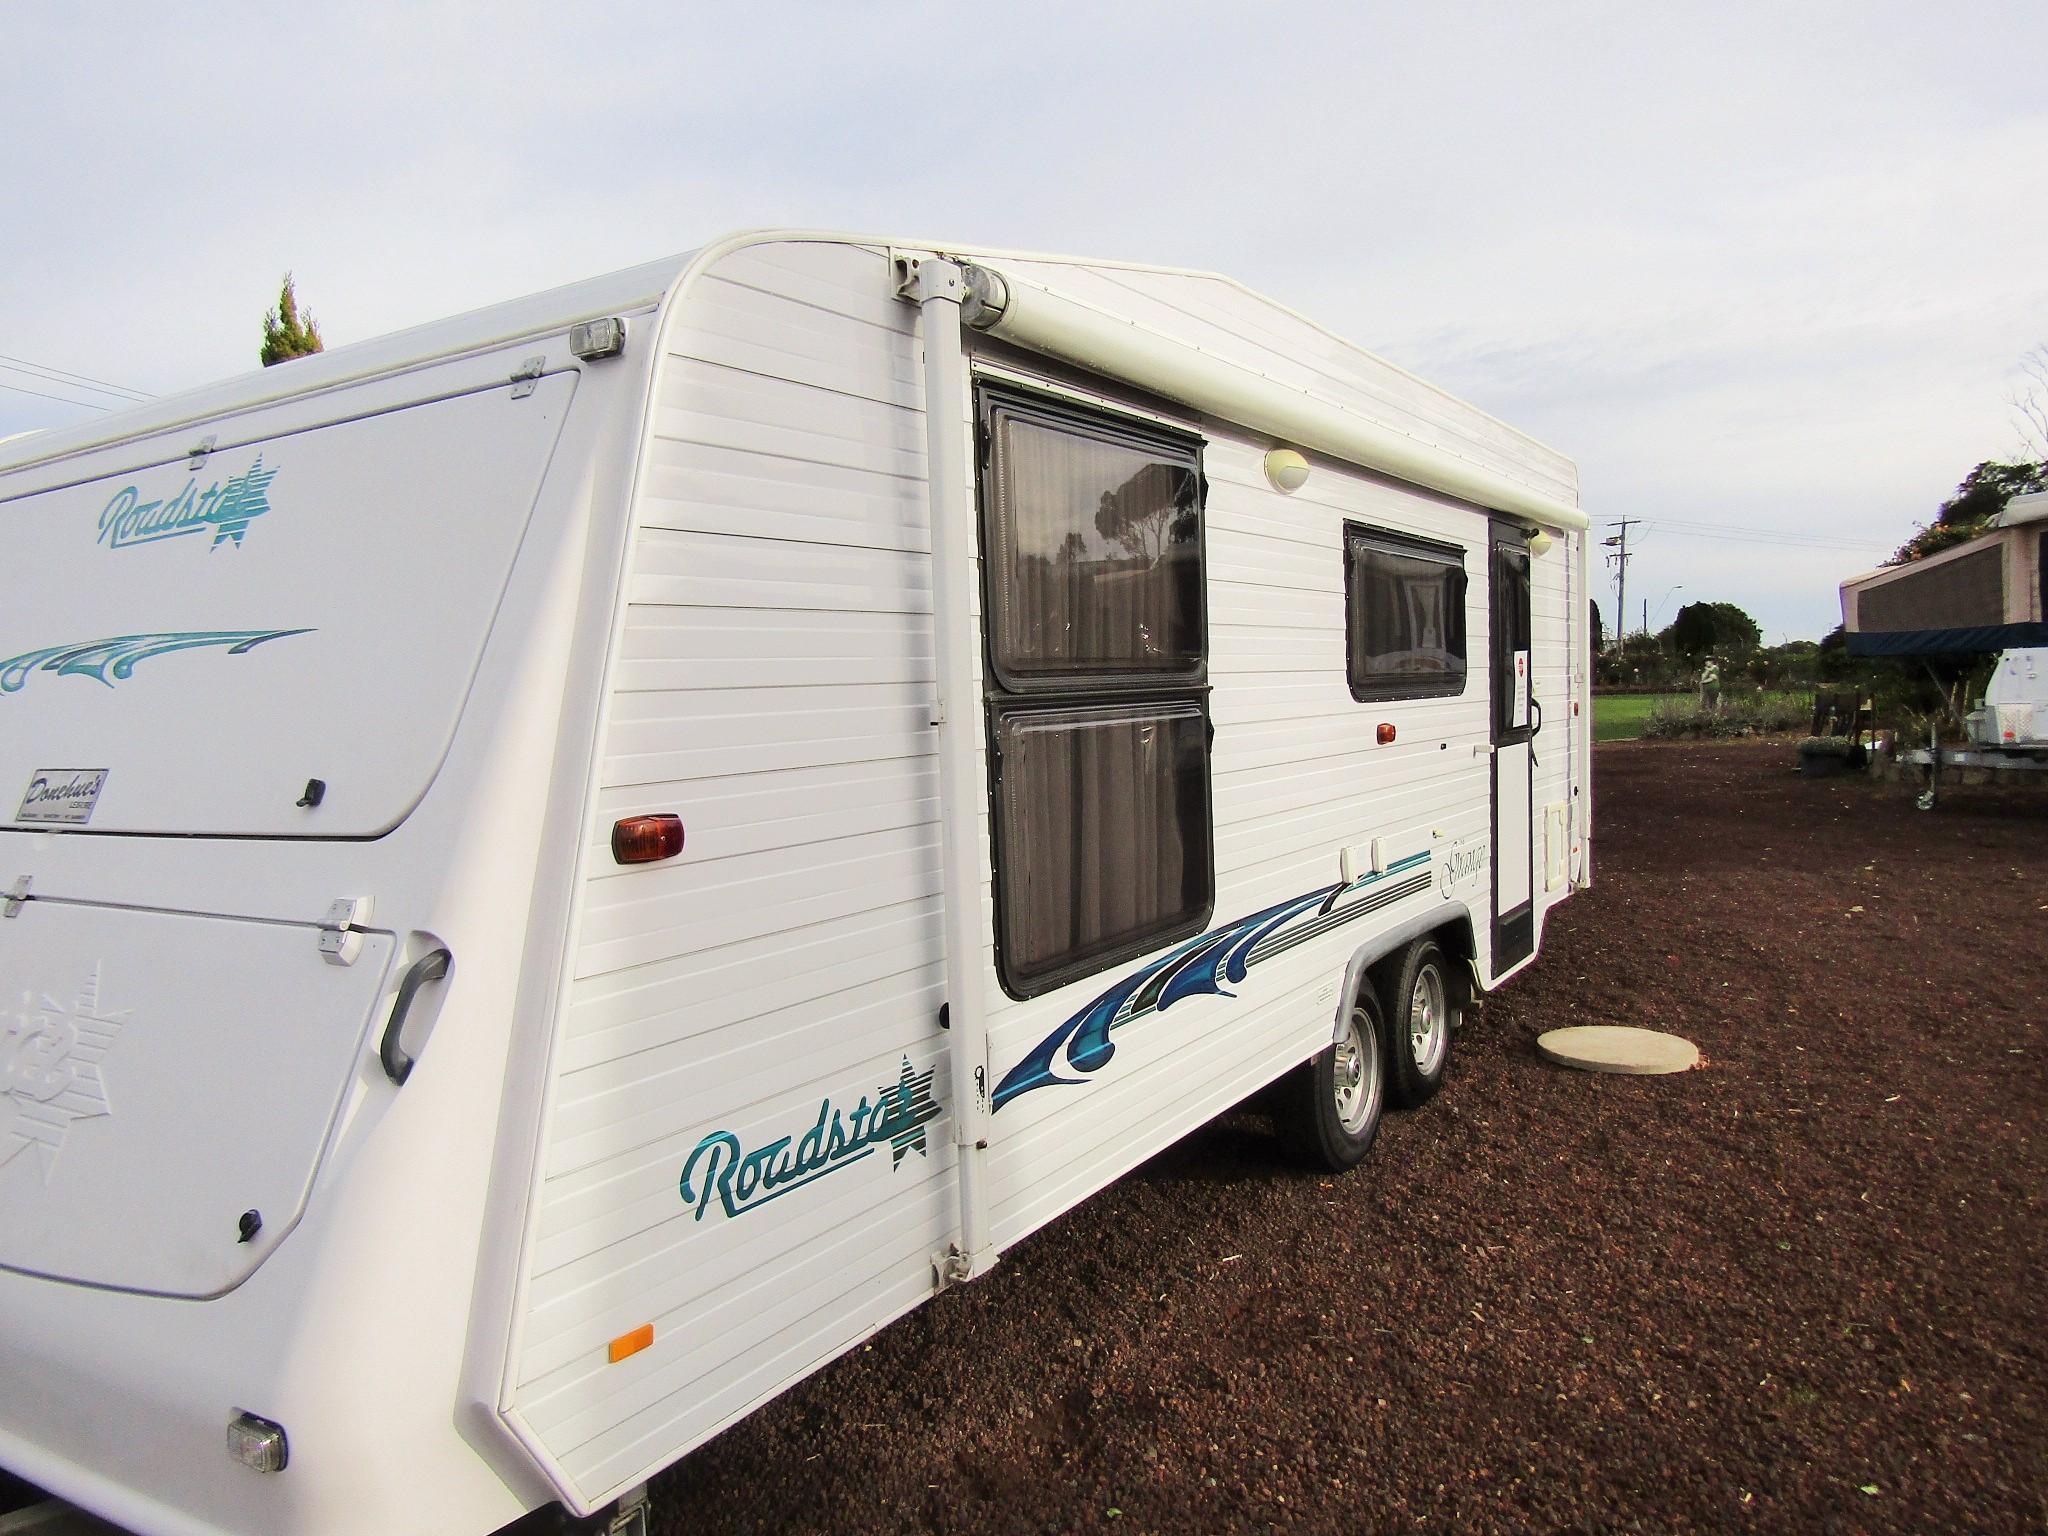 Donehues Leisure Roadstar Grange Ensuite Bathroom Caravan Hamilton 12467h IMG 2634